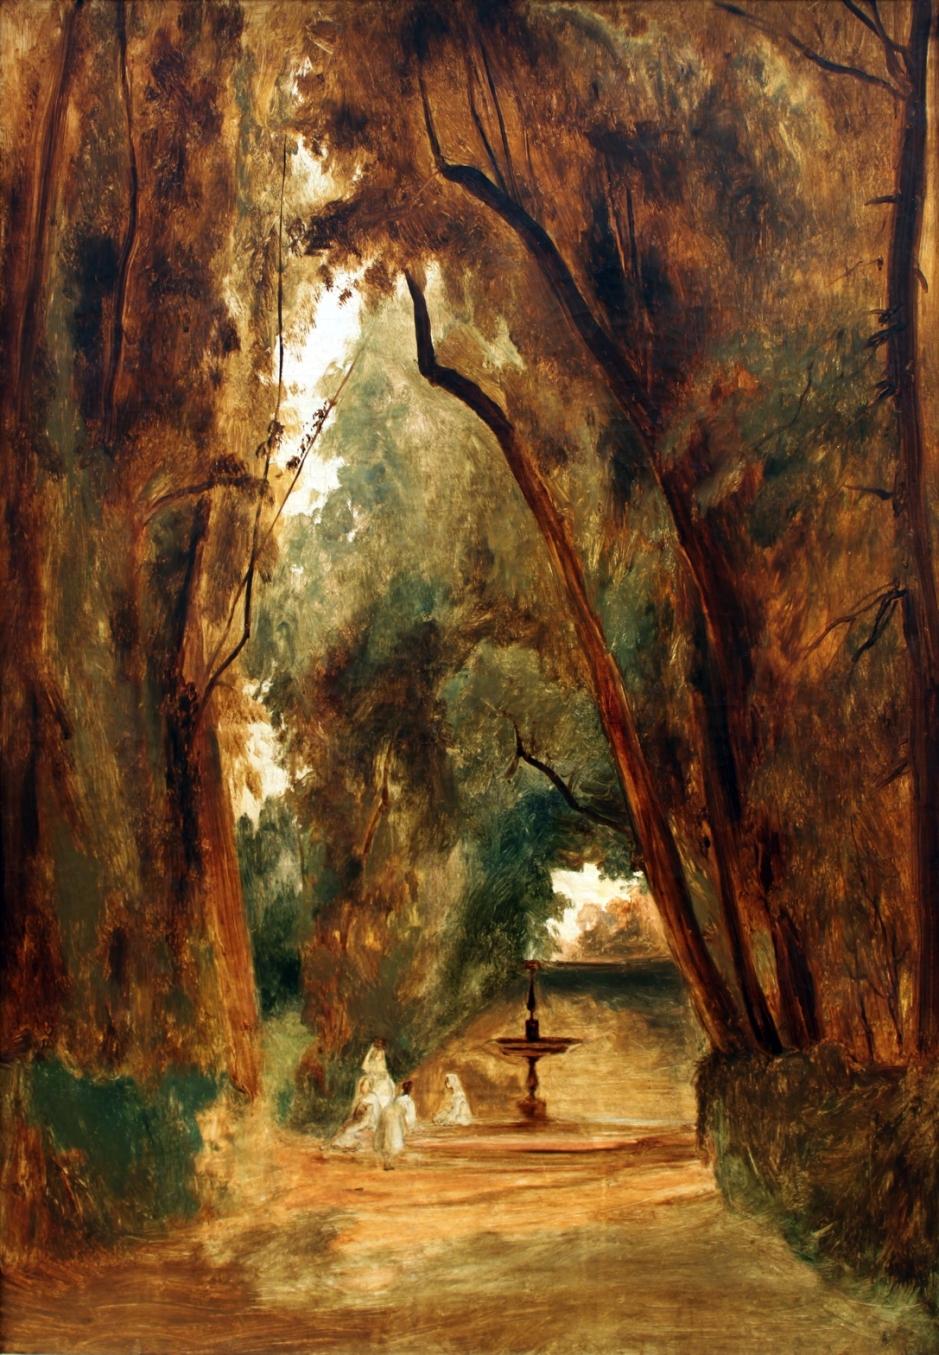 Carl Eduard Ferdinand Blechen, Im Park der Villa Borghese (In the Park of the Villa Borghese) (1823), oil on canvas, 78 x 63 cm, Alte Nationalgalerie, Berlin. Wikimedia Commons.